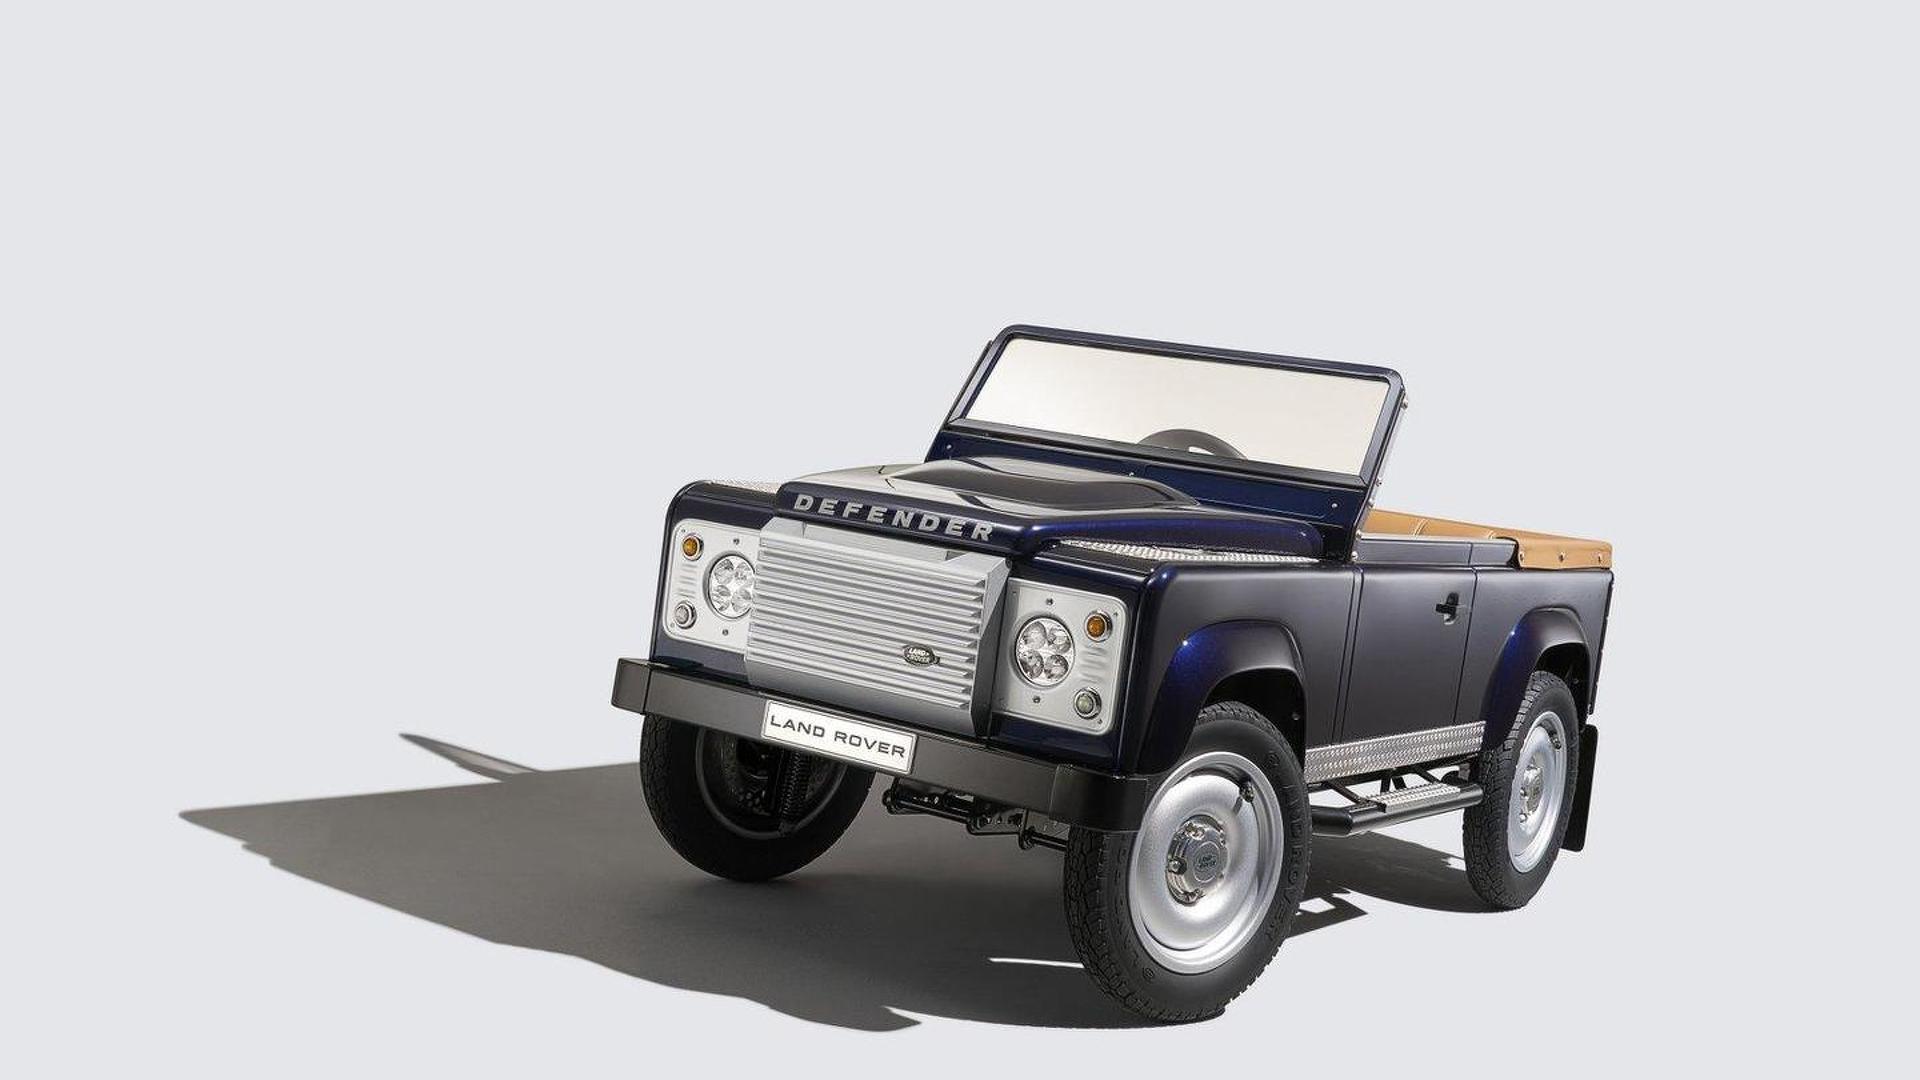 Land Rover Defender Pedal Car concept makes a surprise debut in Frankfurt